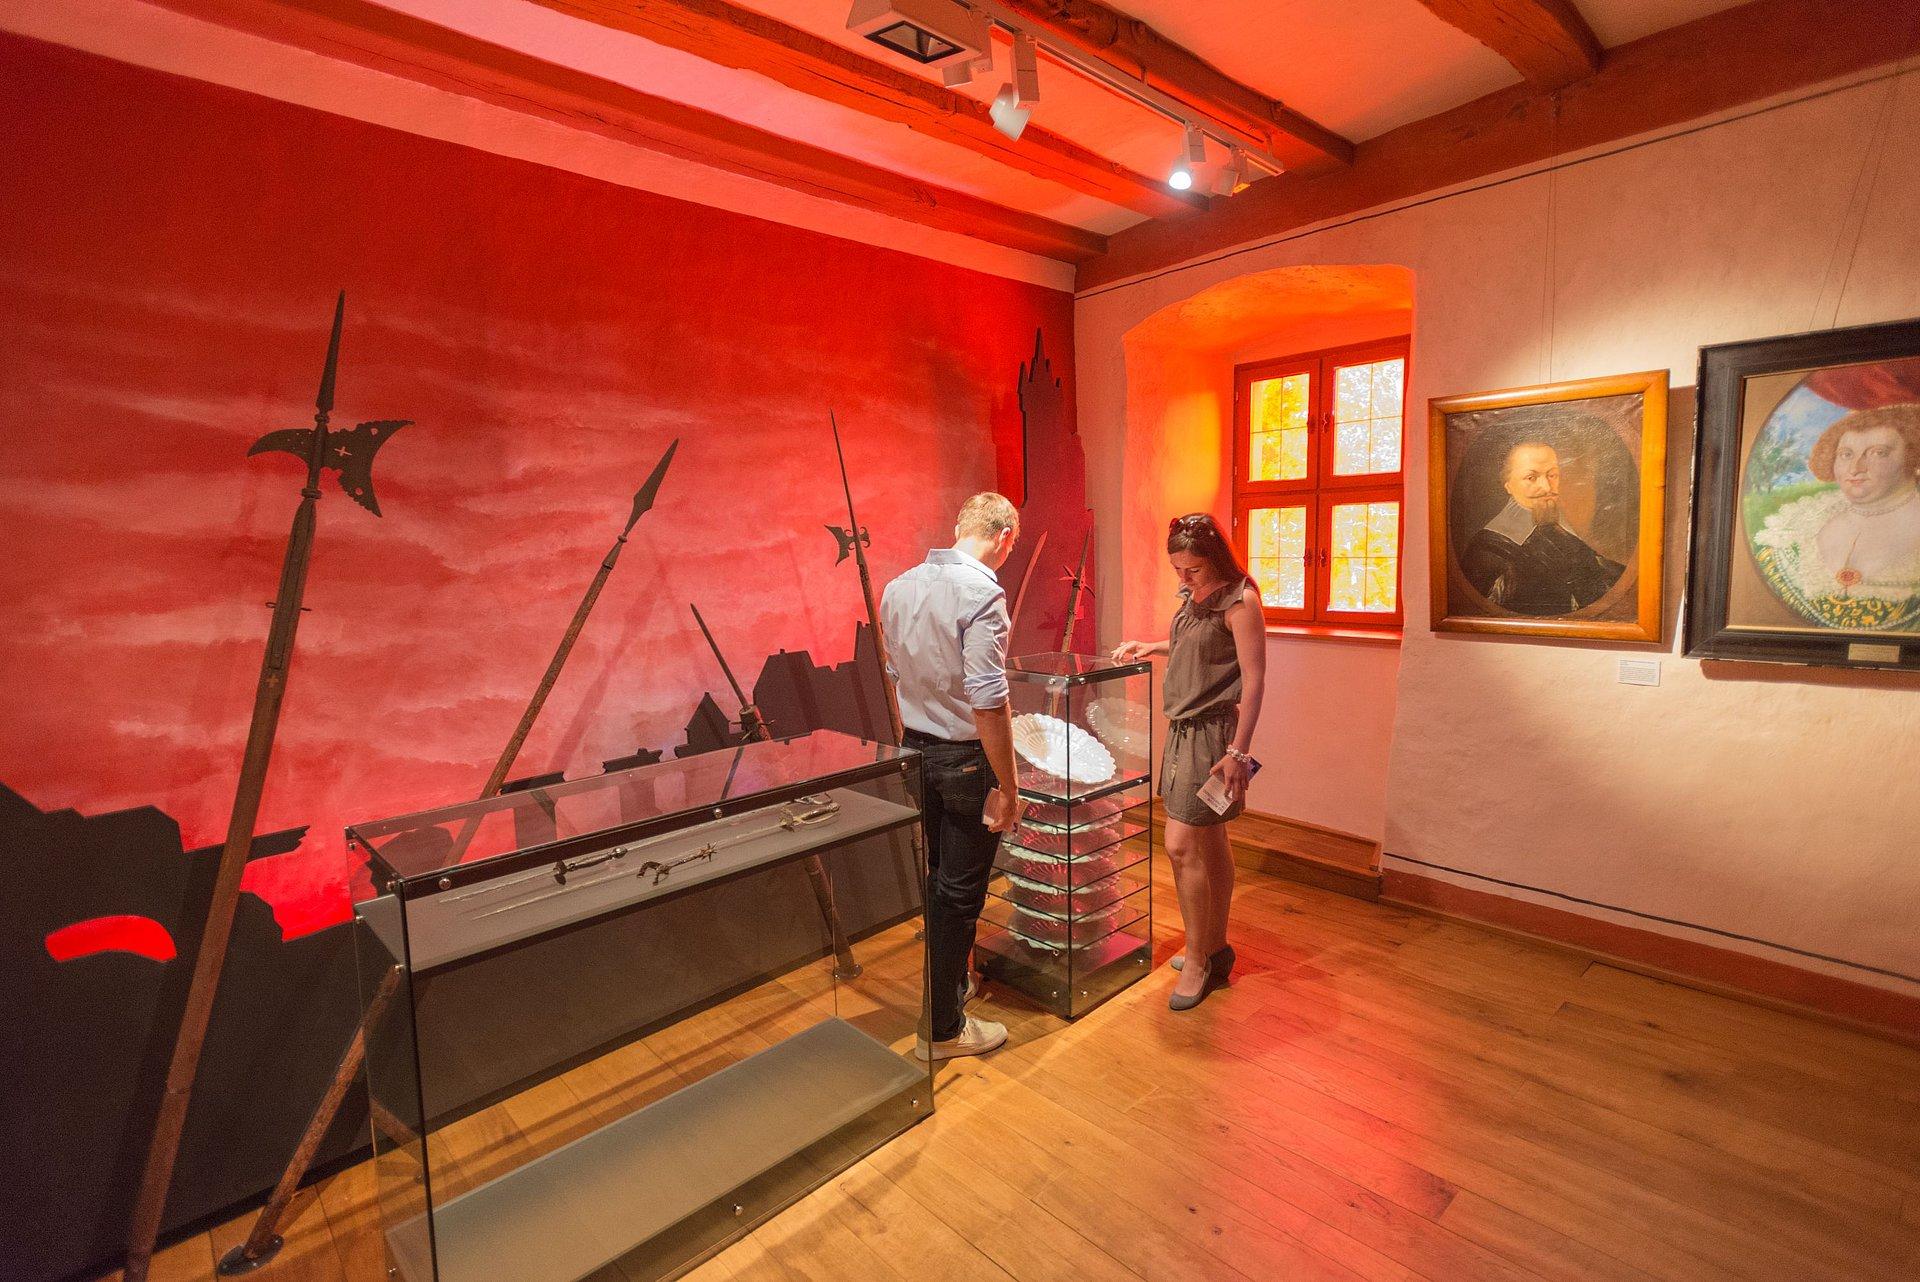 Tentoonstelling in het Museum Grafenschloss Diez, Lahndal